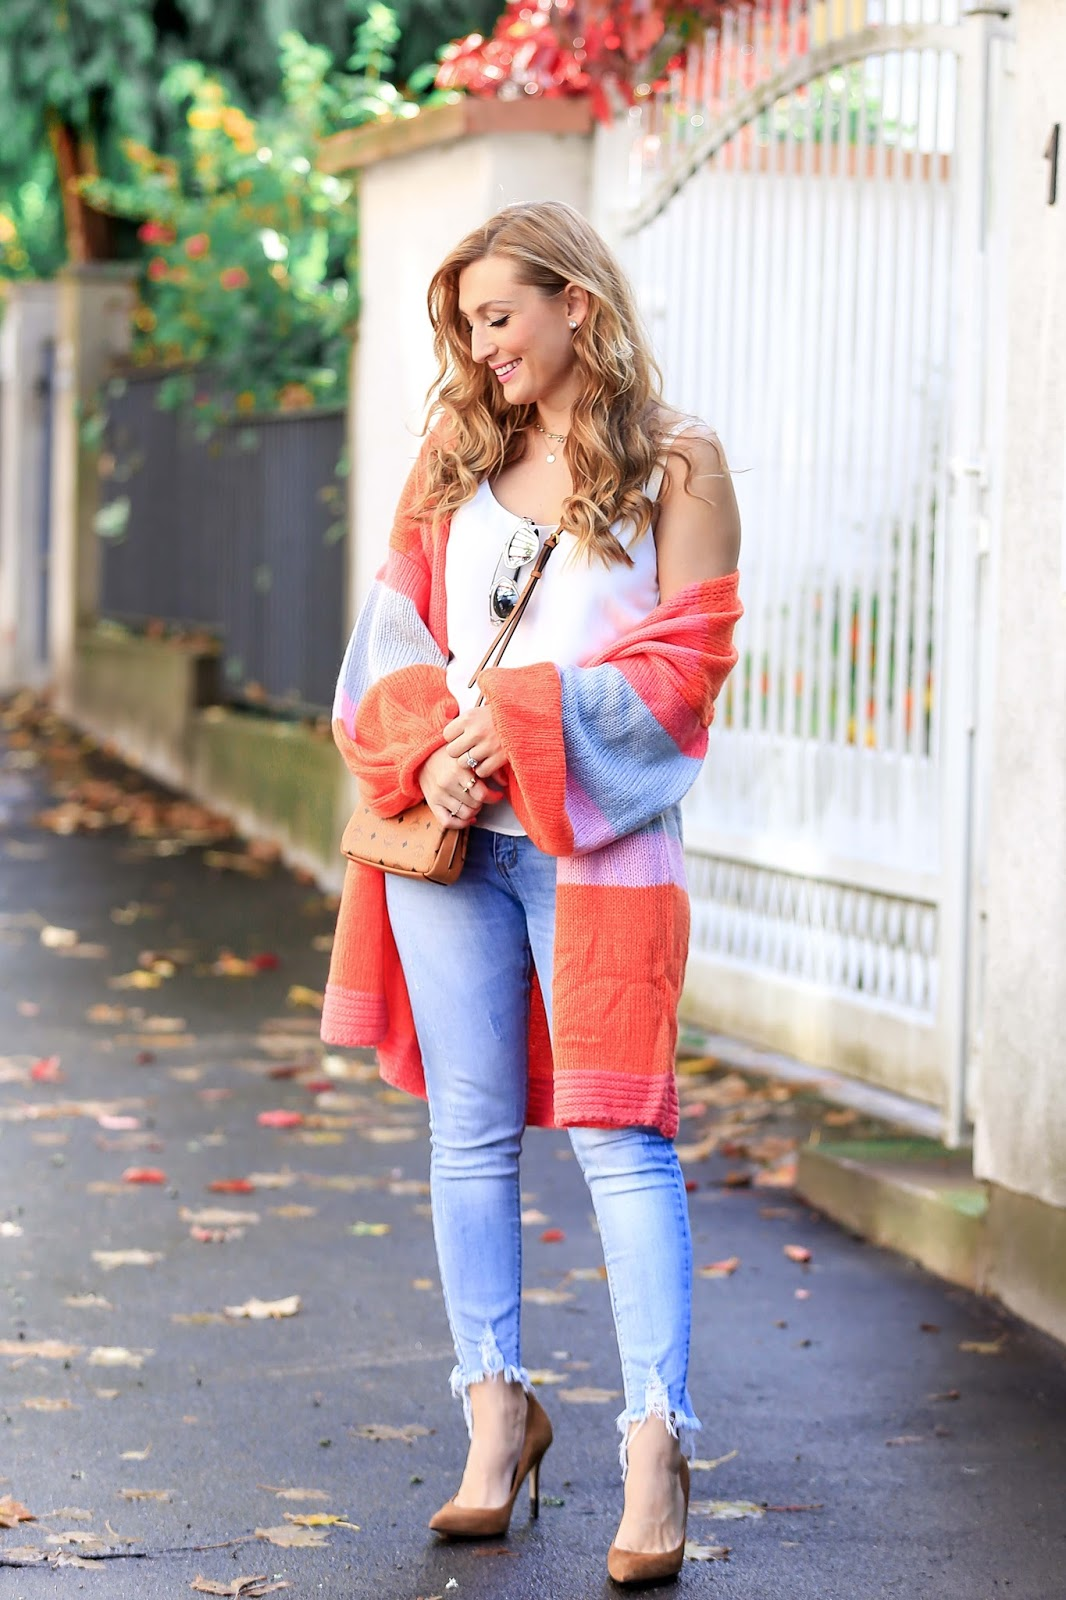 Bunter-cardigan-Fashionstylebyjohanna-blogger-Frankfurt-deutschlandfashionblog-outfit-ootd-wildleder-pumps-Asostrend-beige-altrosa-oversize-cardigan-bunt-jeans-pailletten-top-chanel-camera-vintage